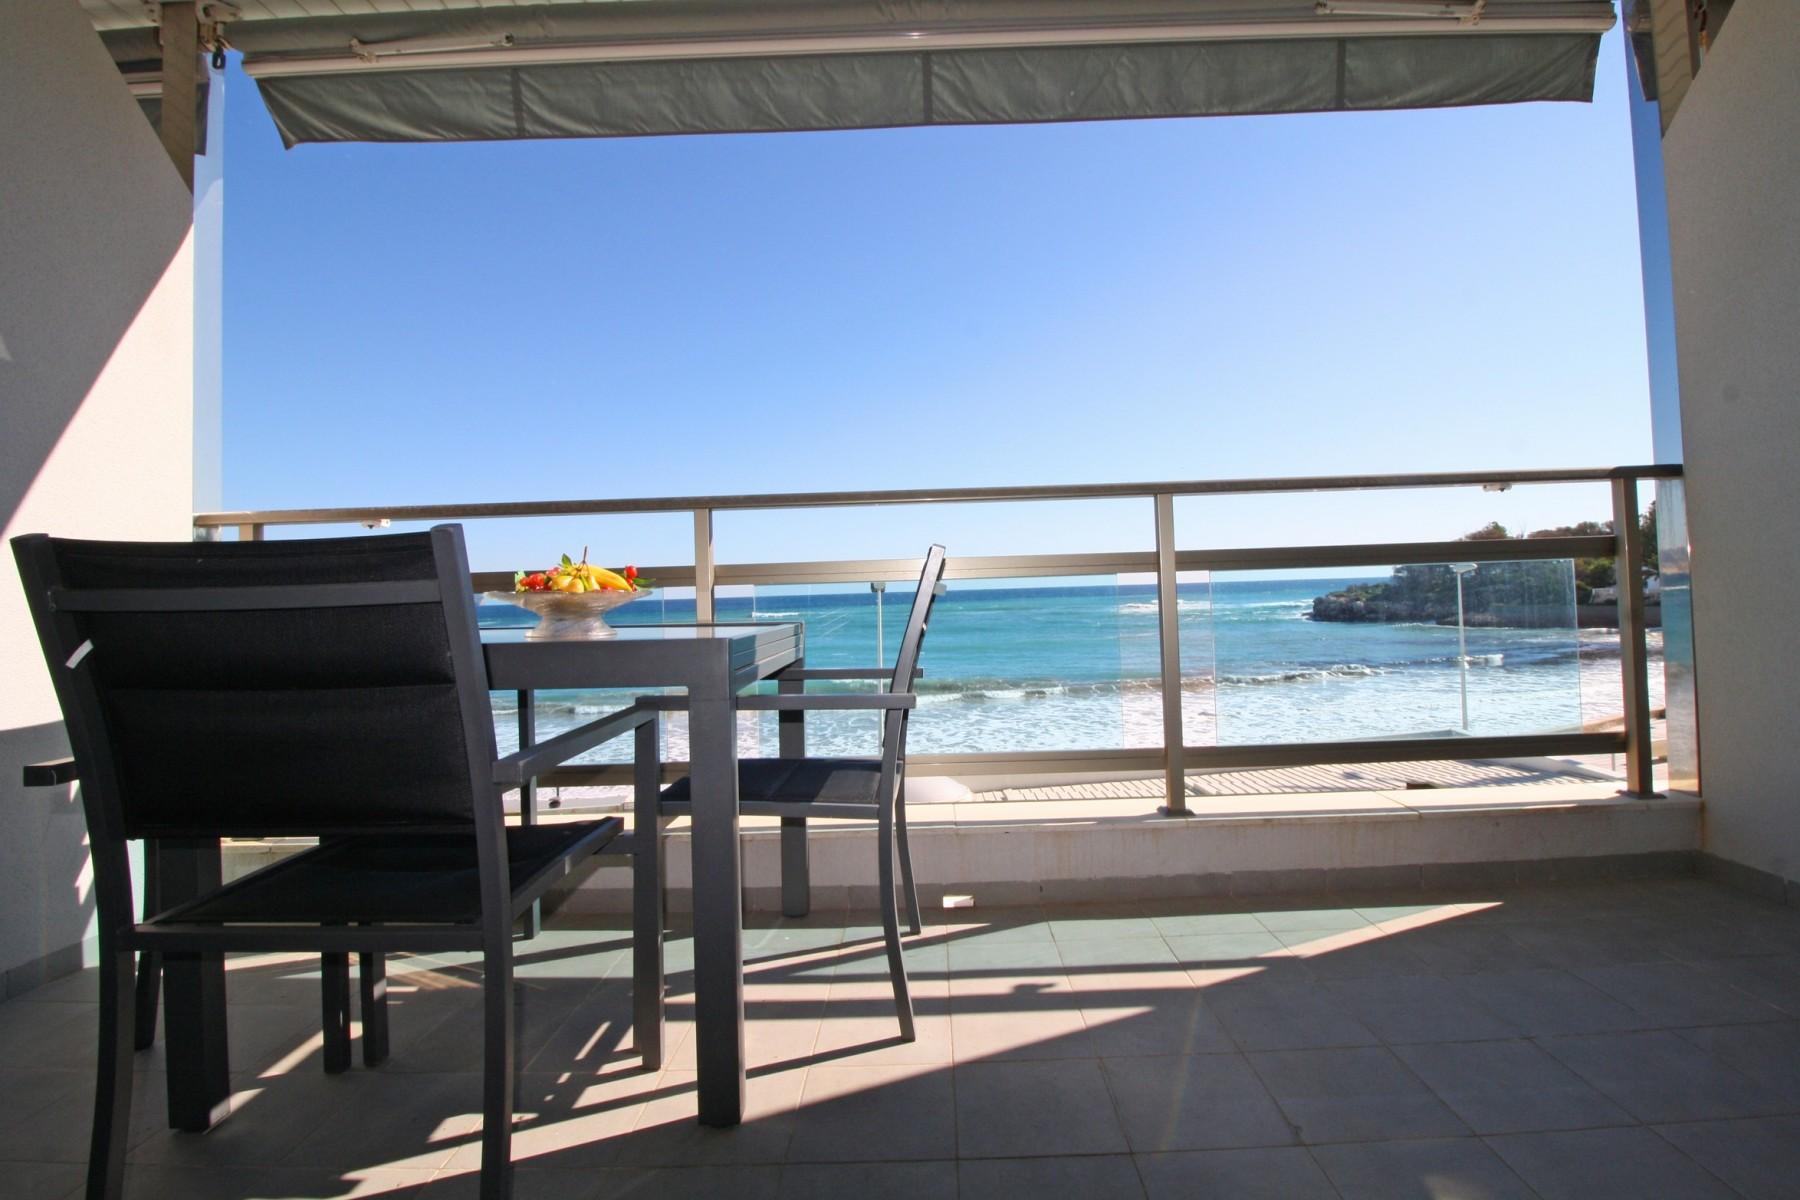 Frentemar 2-7 for 5 guests in Calpe, Spanien